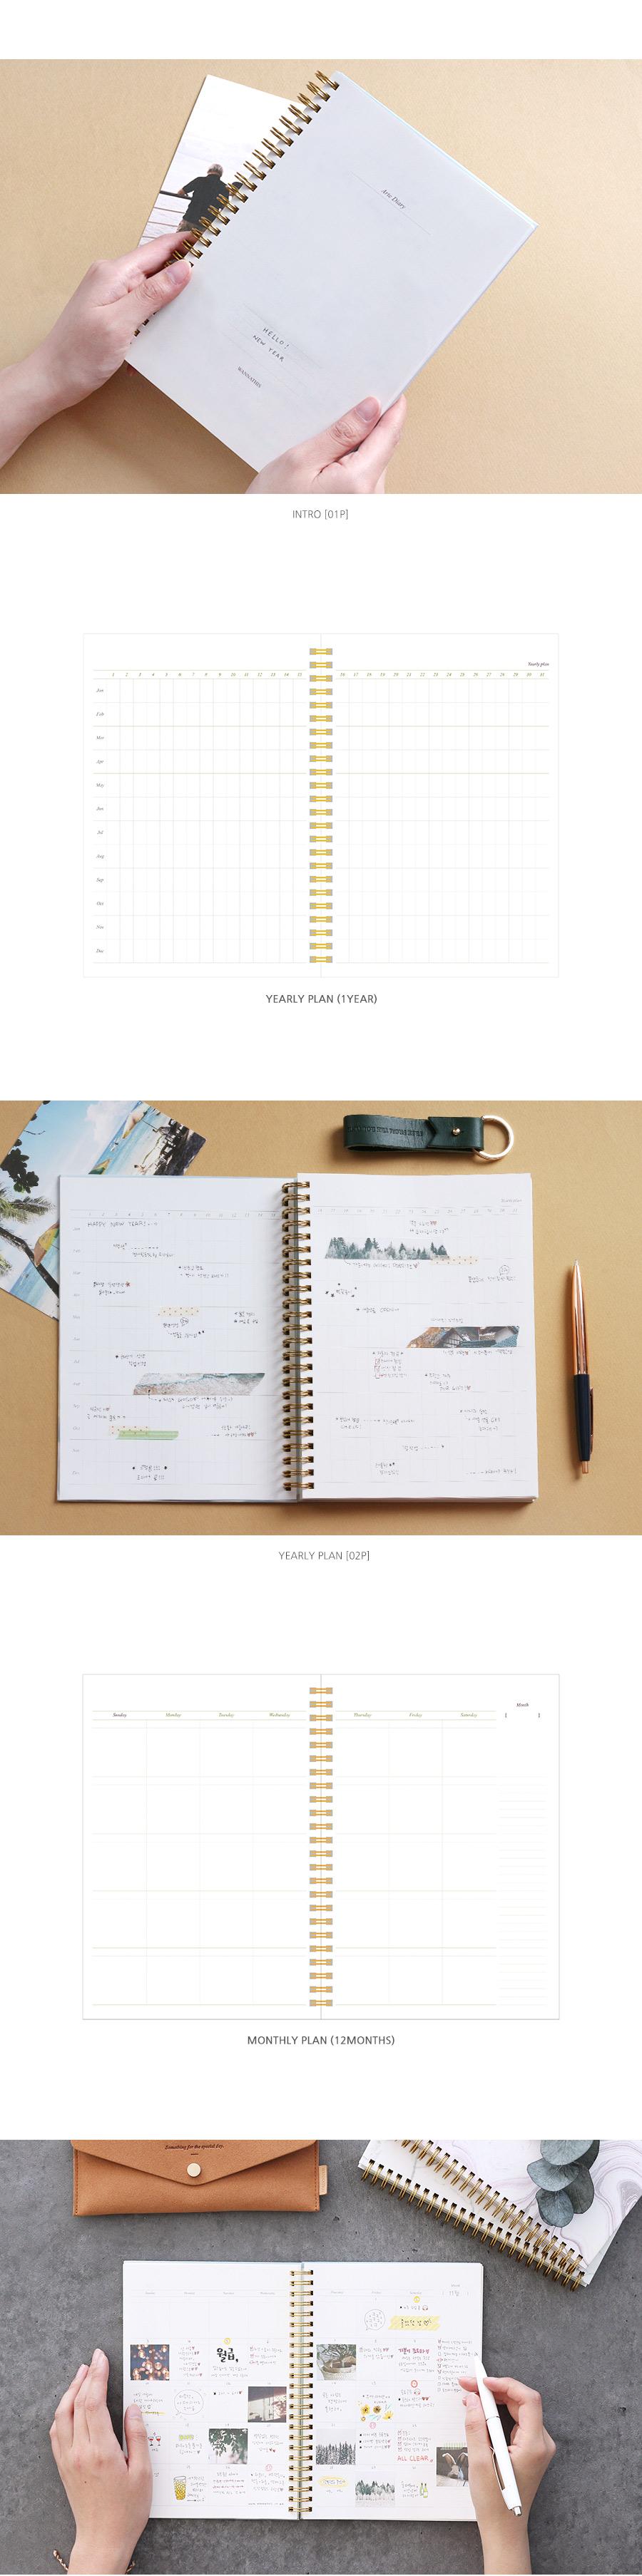 2021 diaries diary [2021 diary, 2021 diaries, diaries 2021]